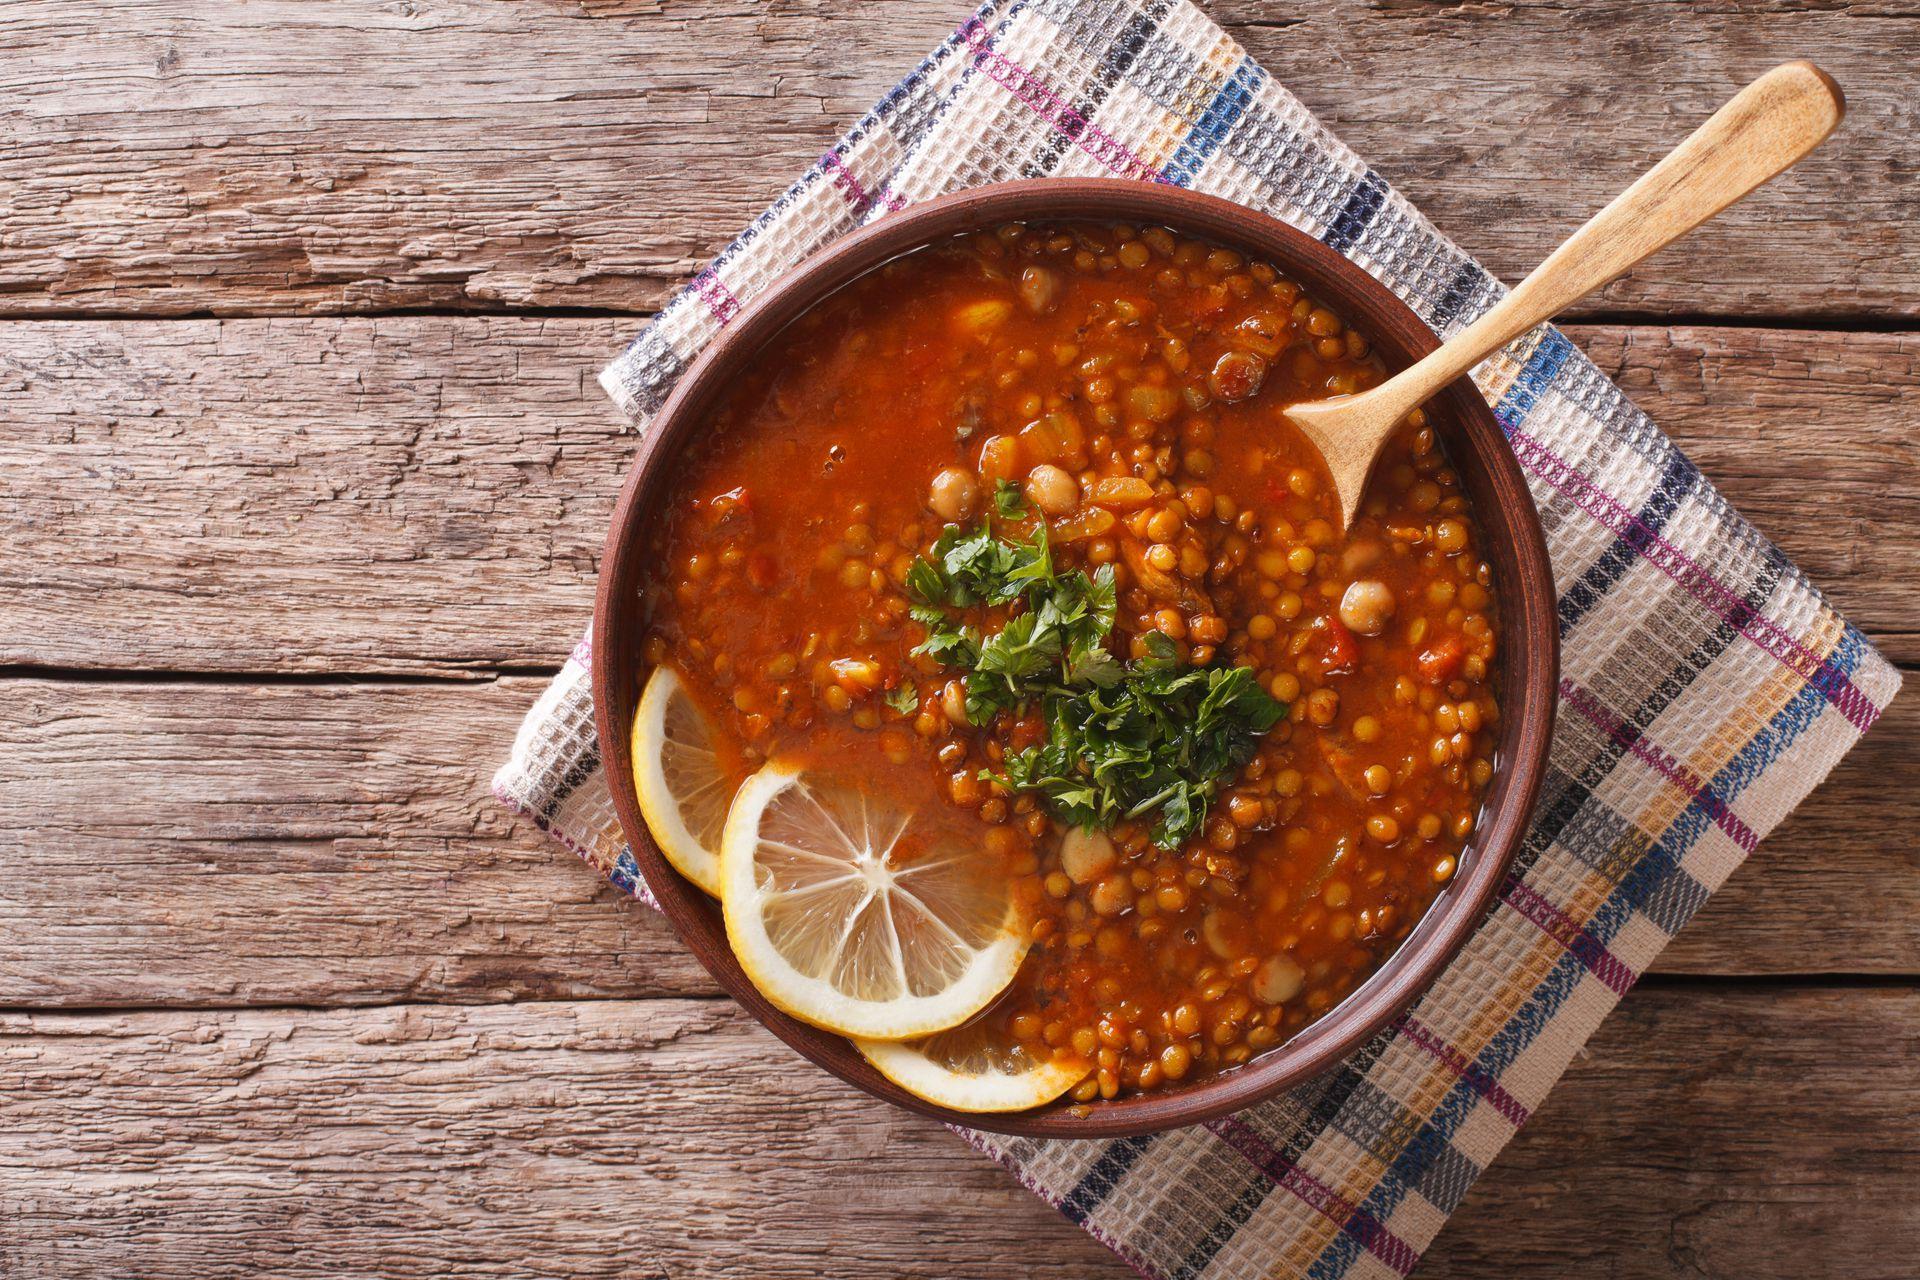 La tradicional exquisitez argentina debe ser servida en un plato hondo